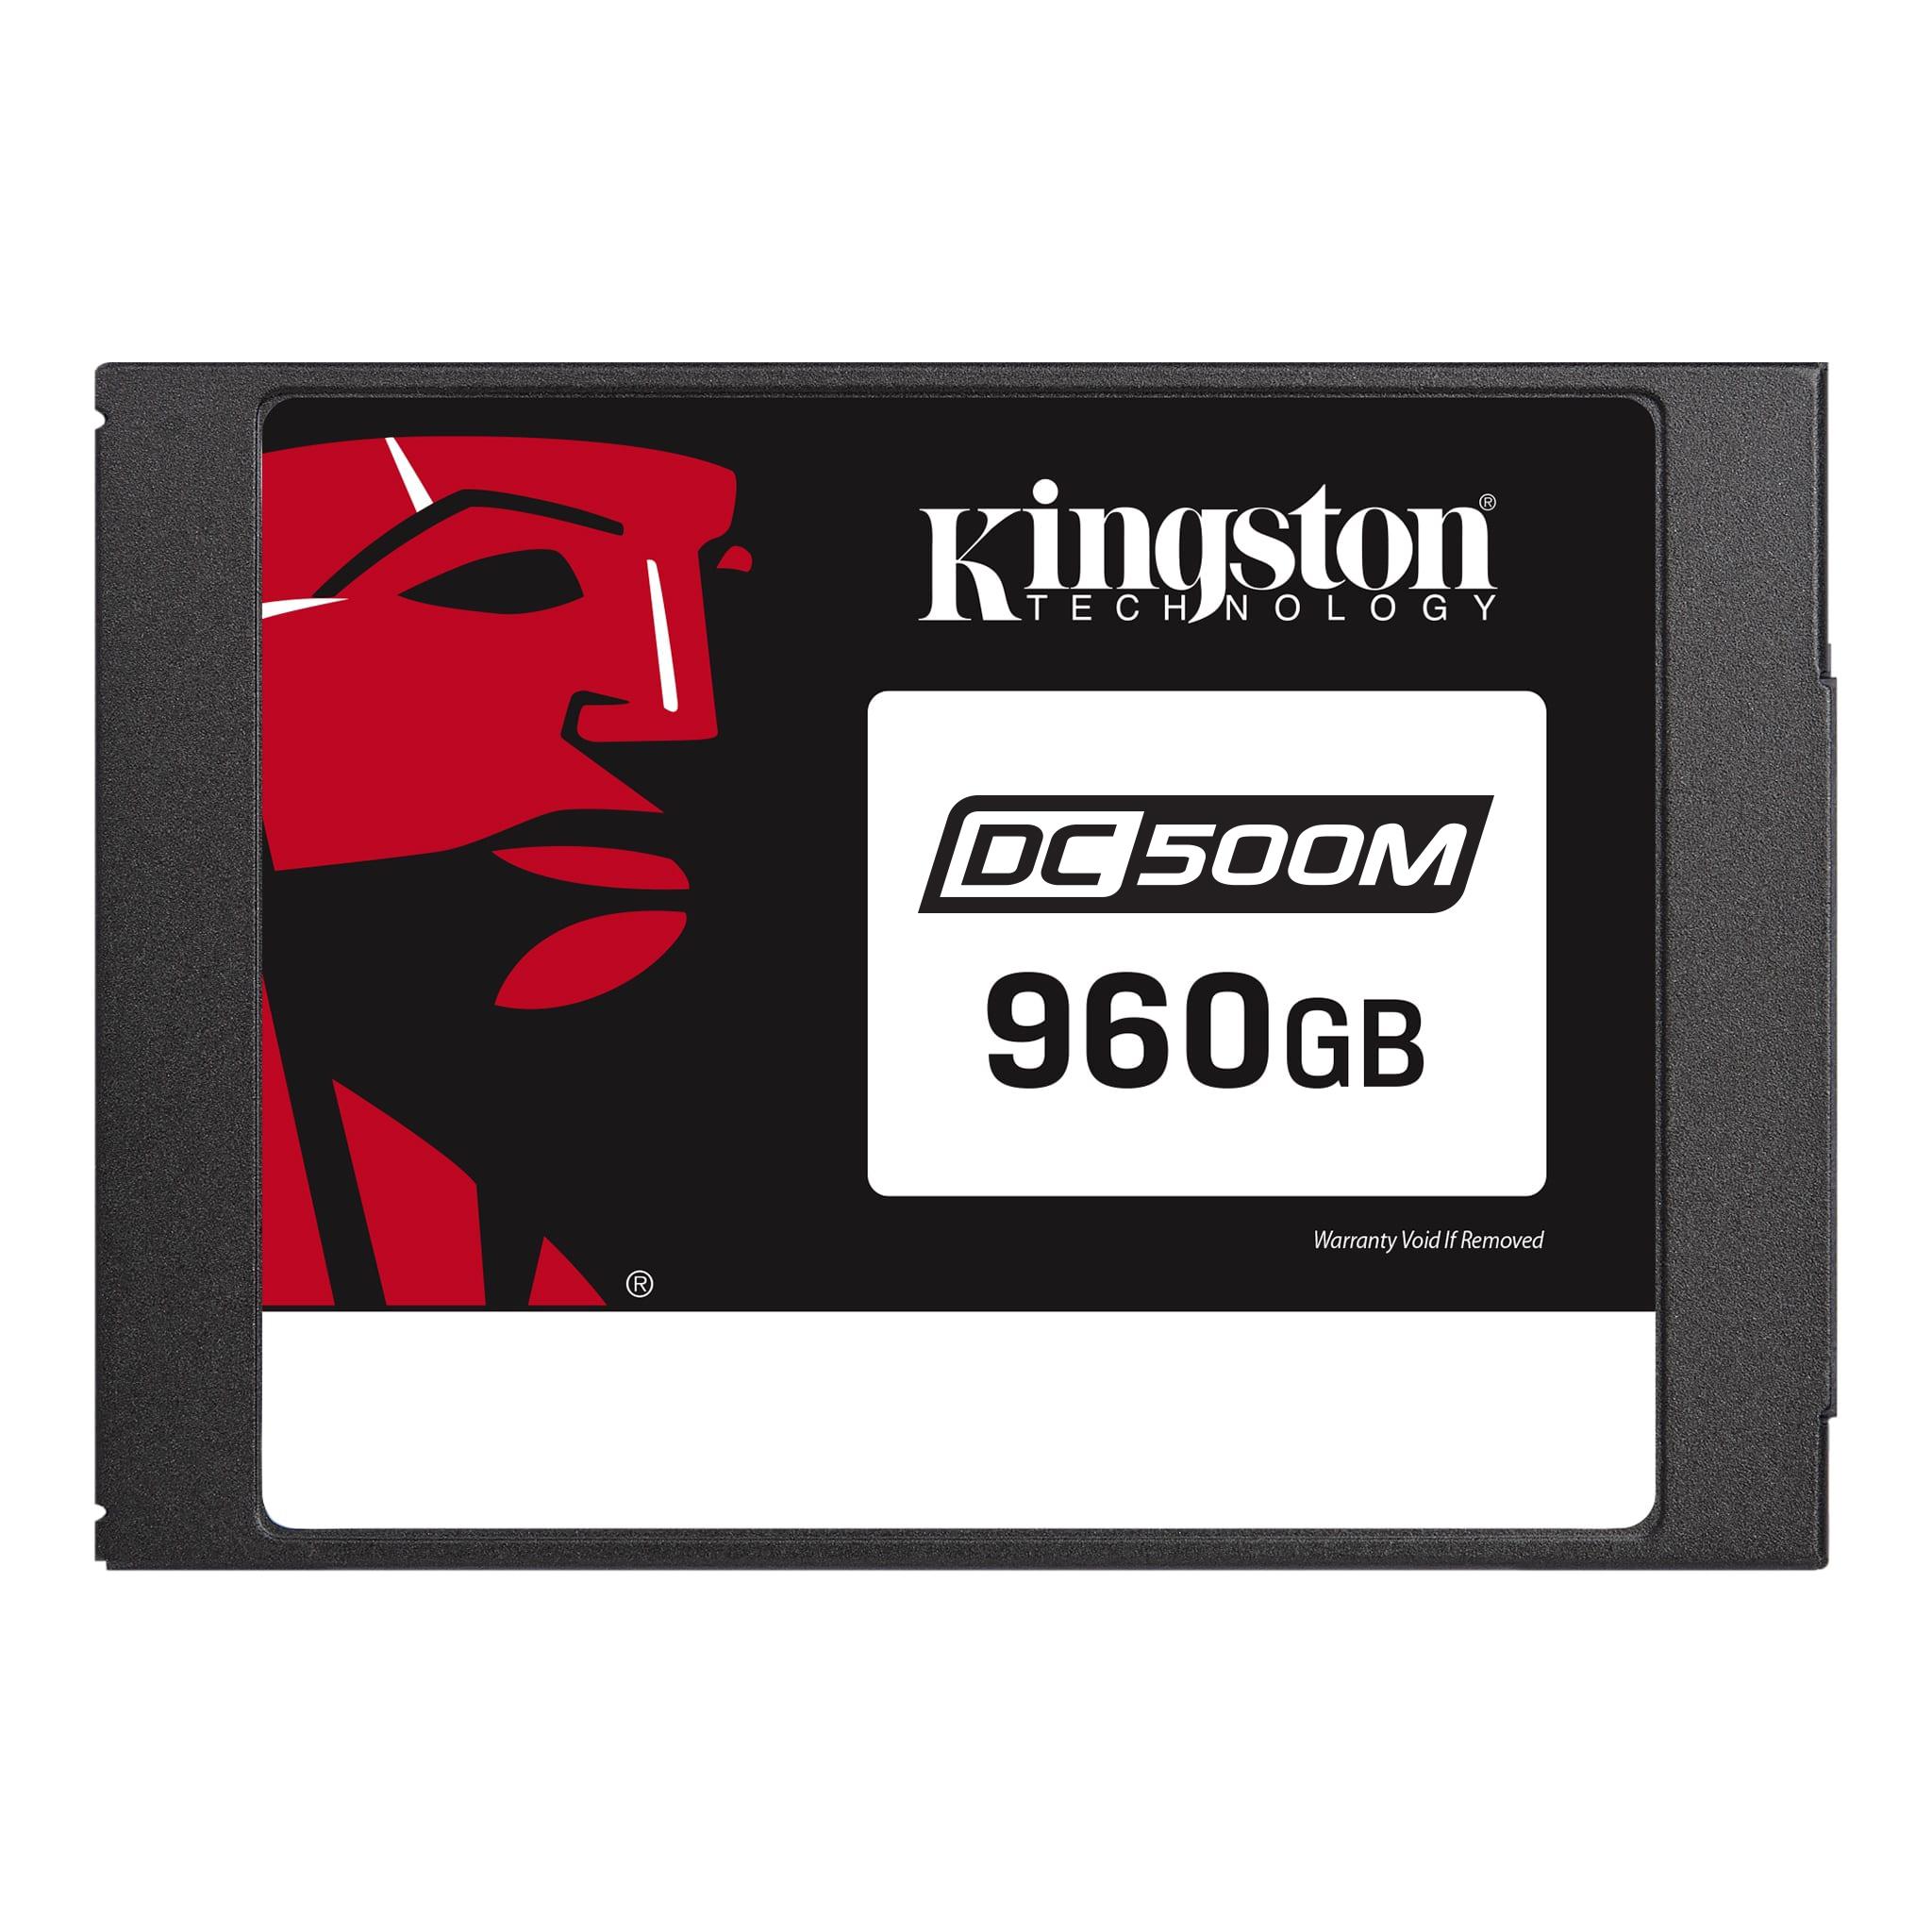 Hard Disk SSD Kingston DC500M 960GB Mixed-Use 2.5